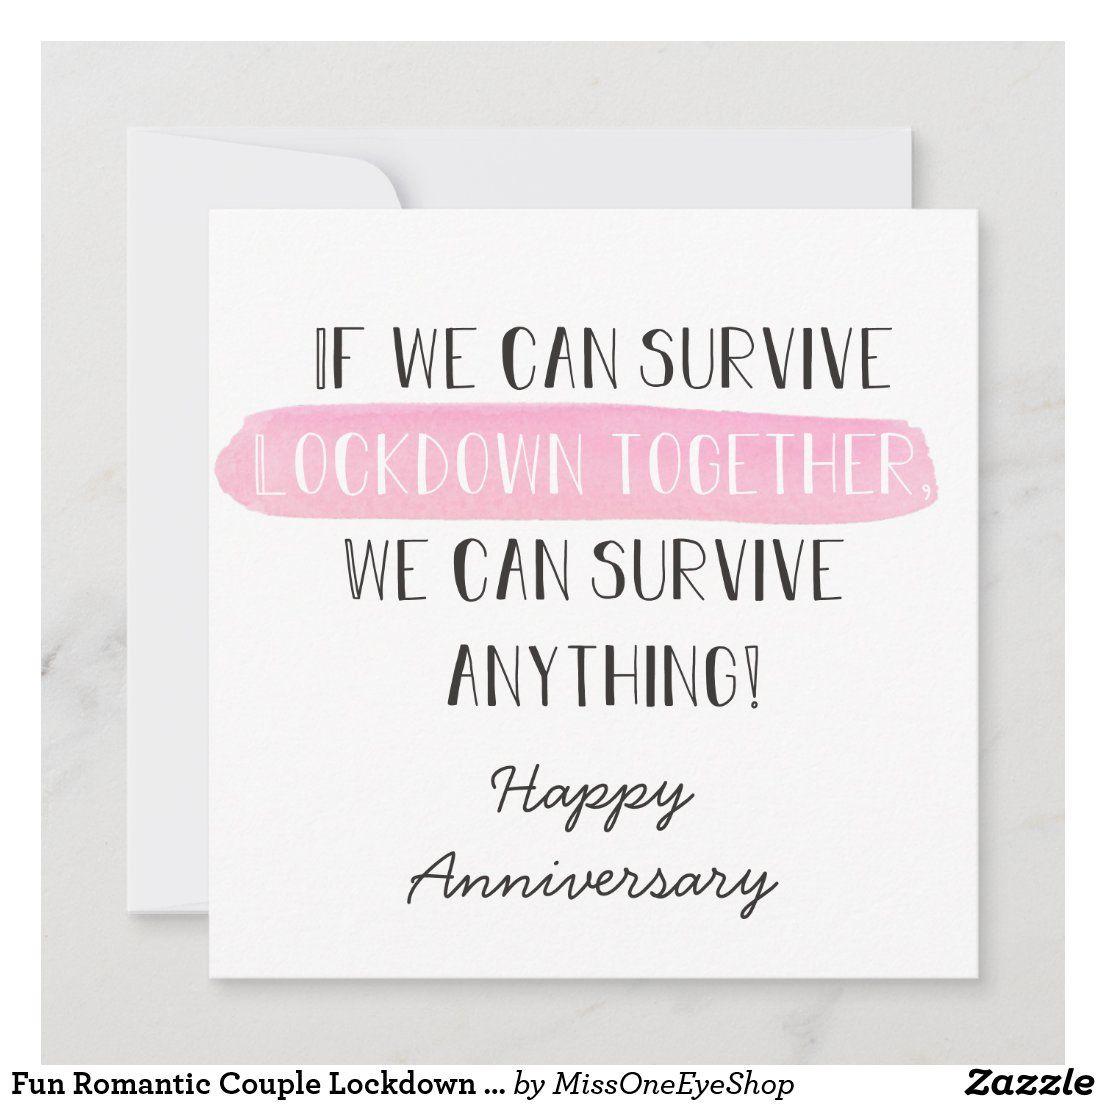 Fun Romantic Couple Lockdown Anniversary Card Zazzle Com In 2021 Husband Birthday Card Anniversary Cards Personal Celebration